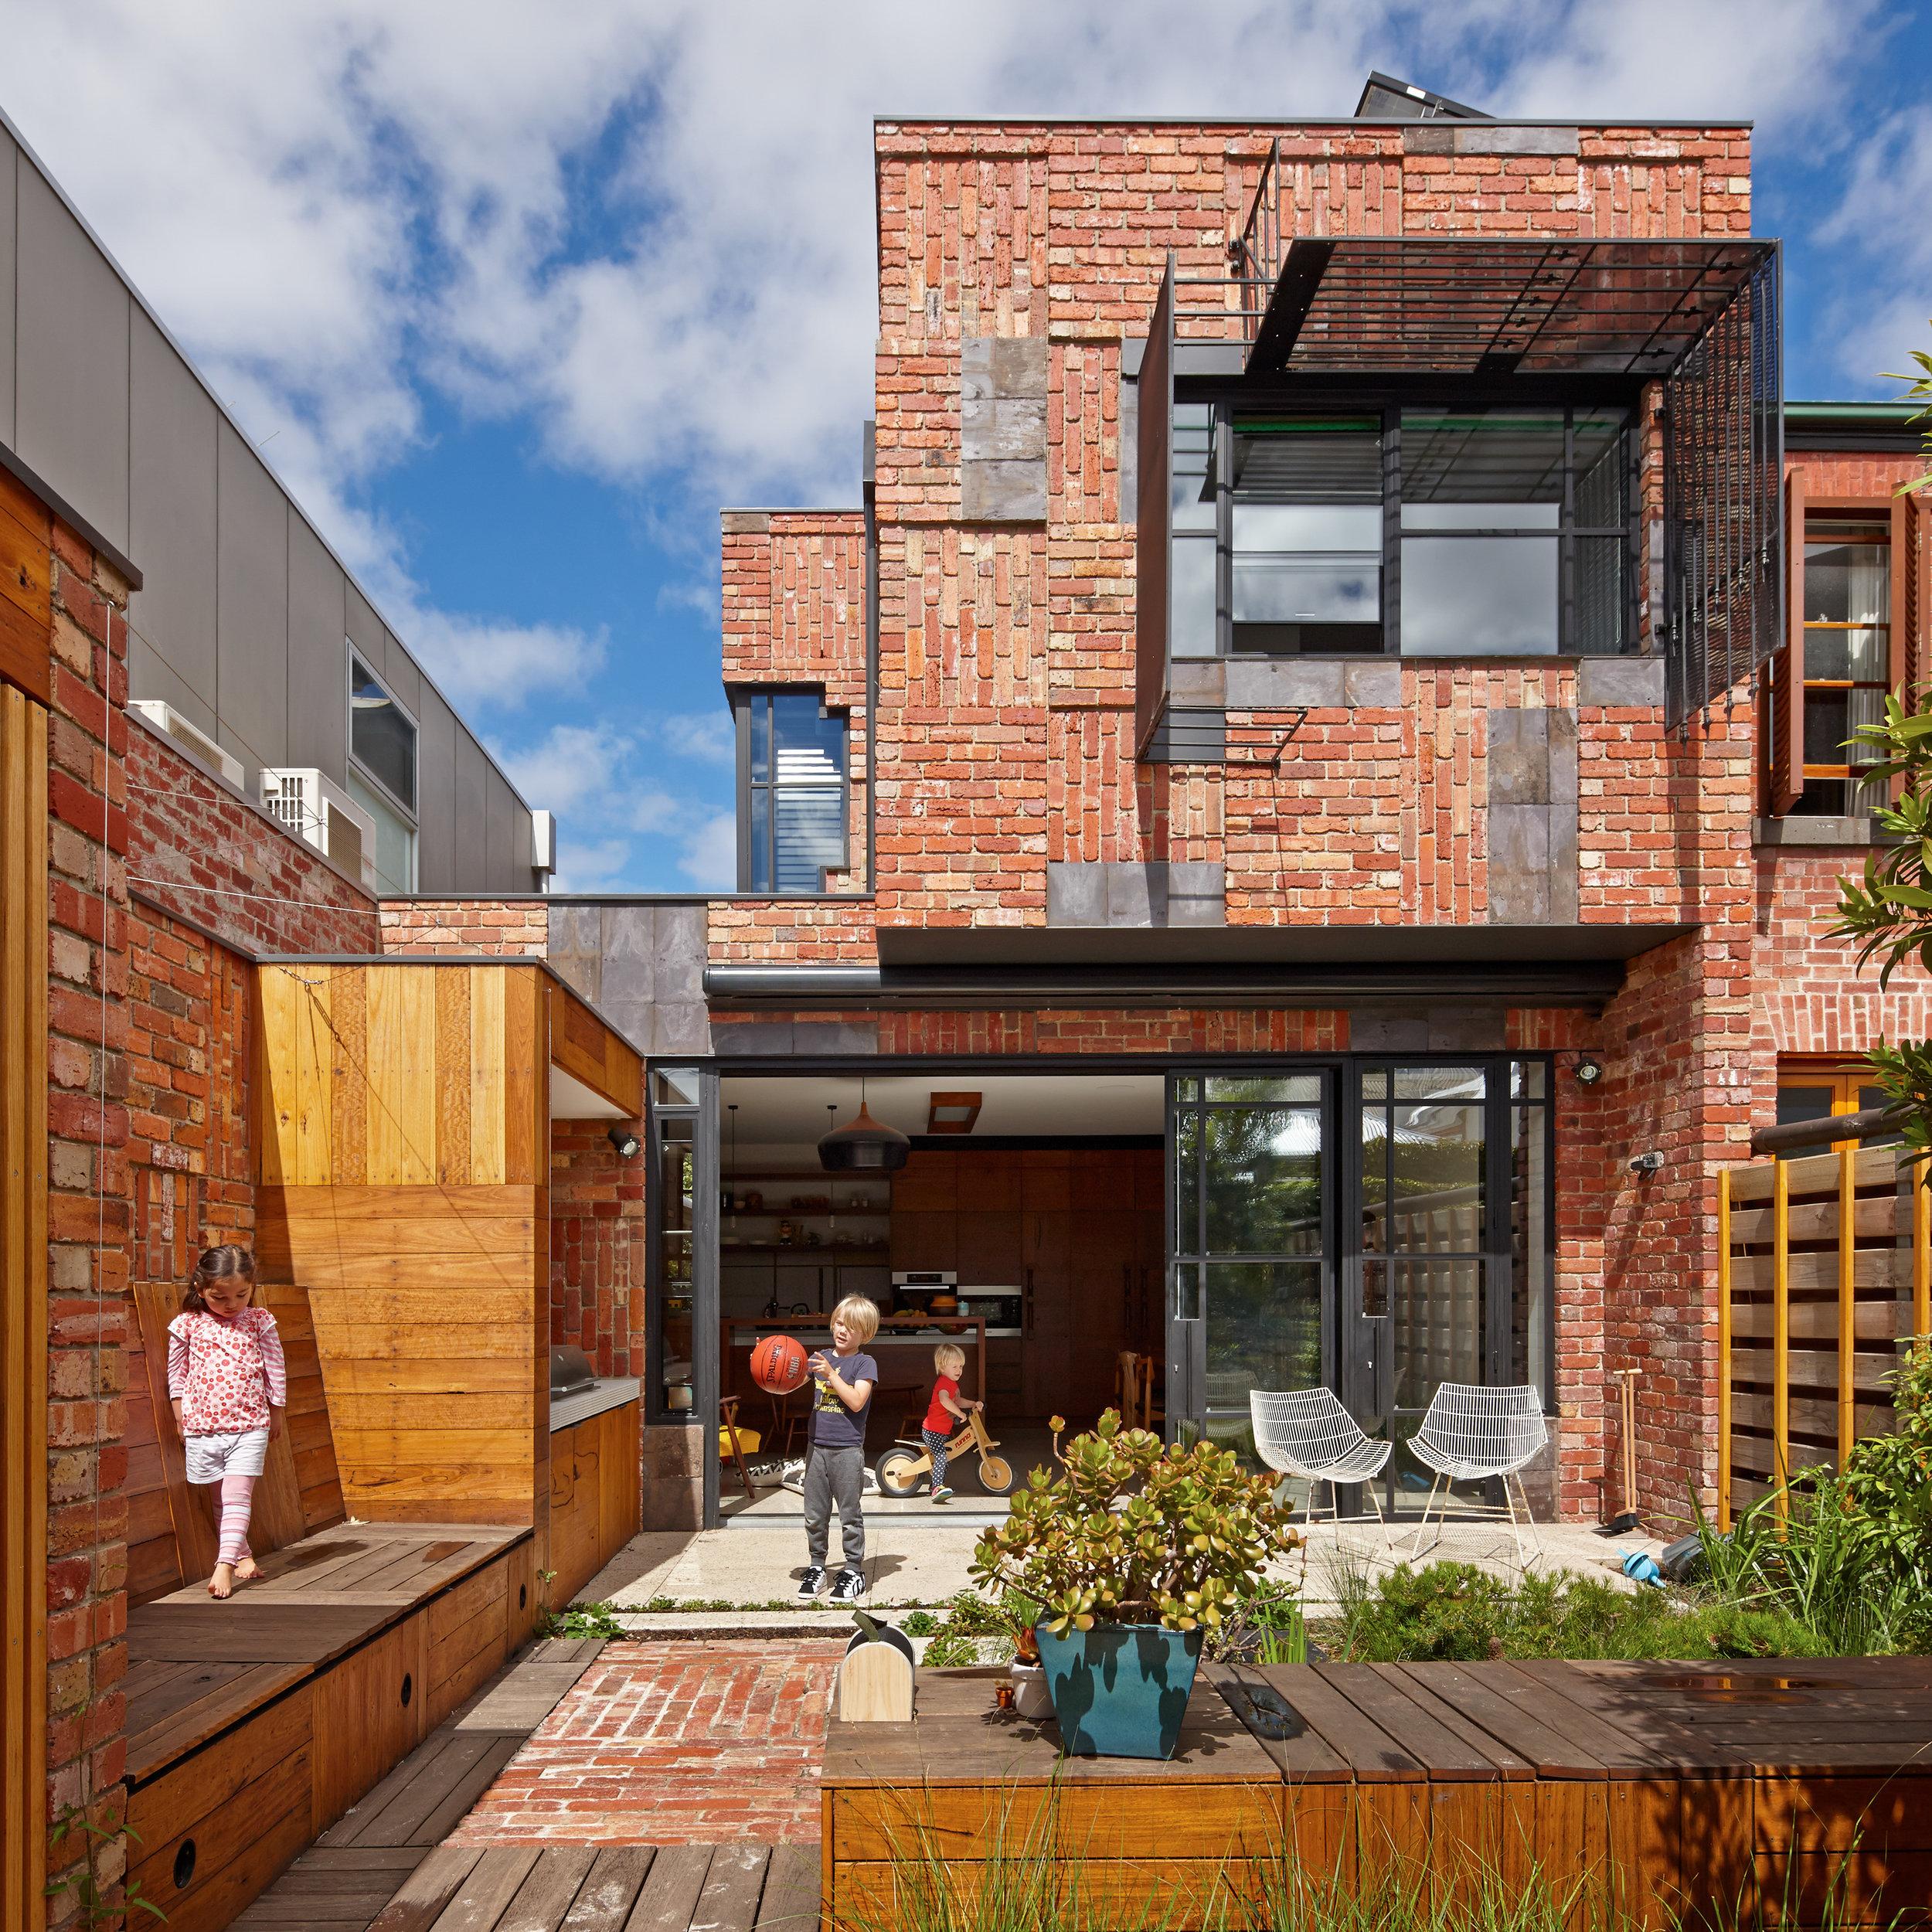 cubo-house-phooey-architects-the-design-emotive-10.jpg